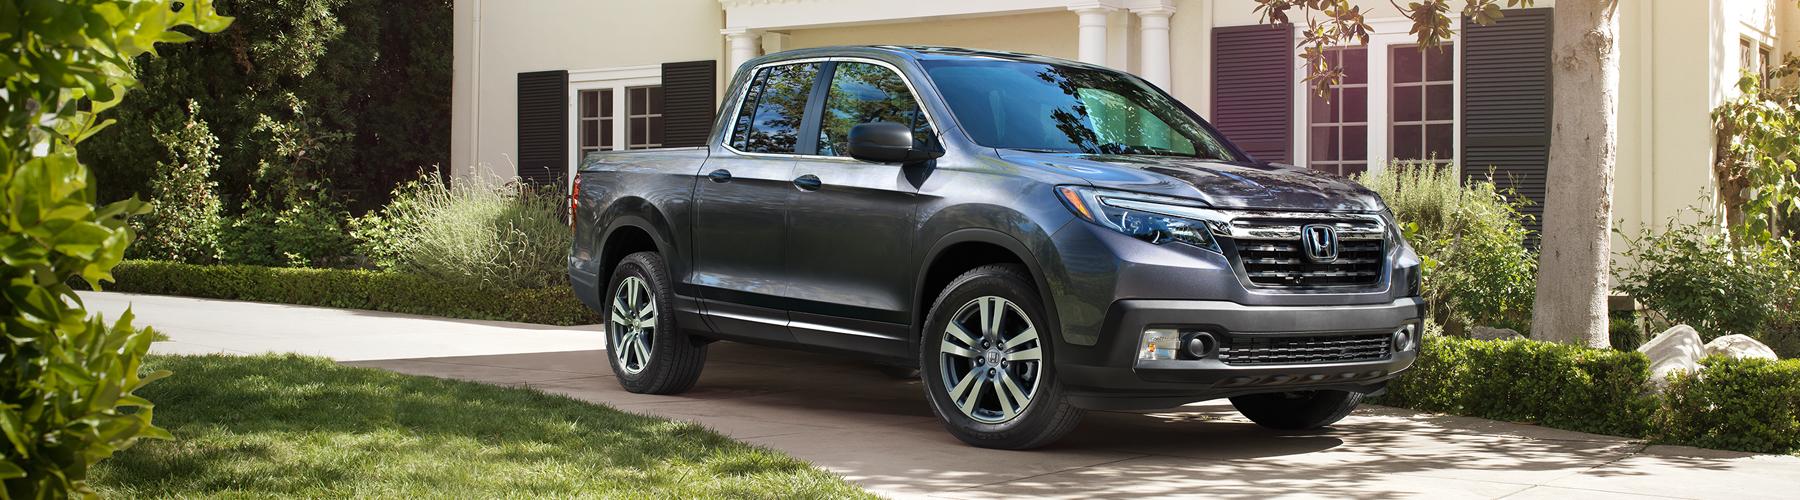 2017 honda ridgeline hampton roads honda dealers new trucks. Black Bedroom Furniture Sets. Home Design Ideas